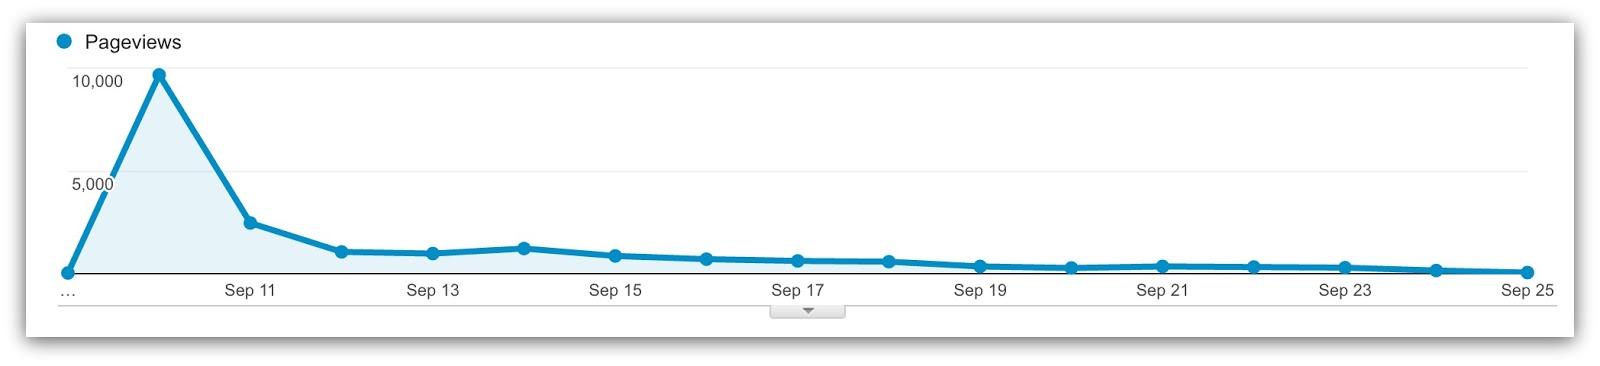 google analytics declining pageviews graph